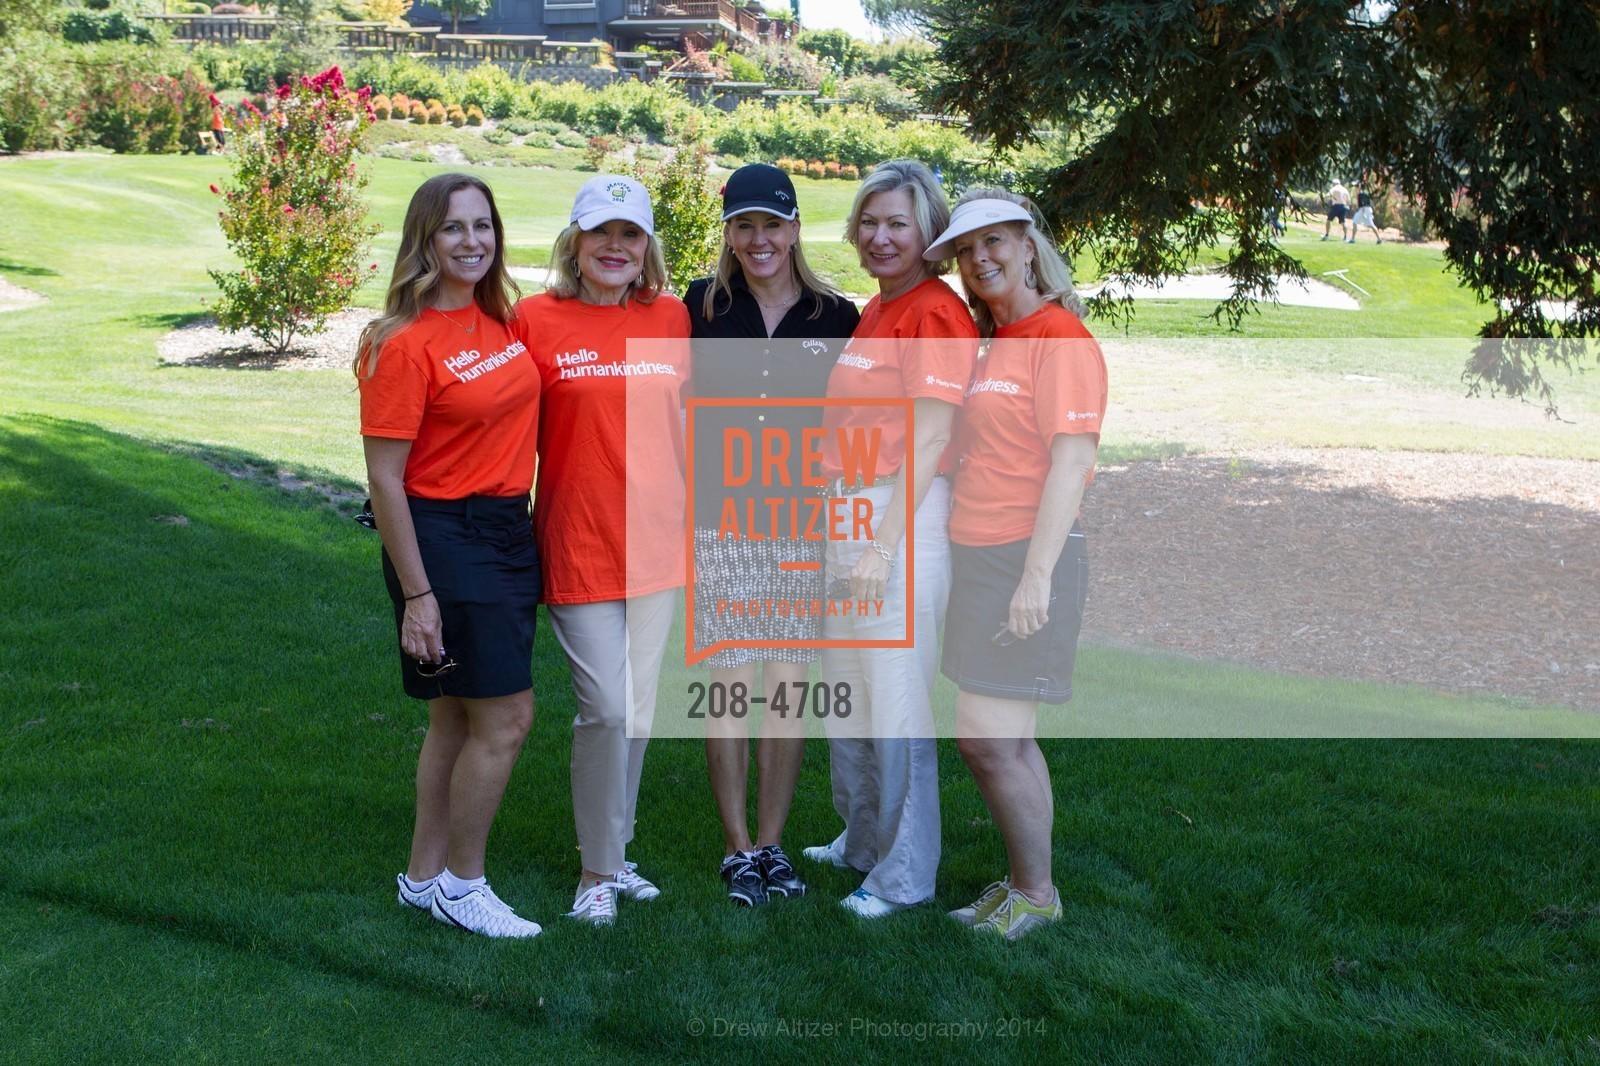 Kim Jamison, Nancy Greenbach, Tina Michelson, Carolyn Rianda, Julie Biglieri, Photo #208-4708